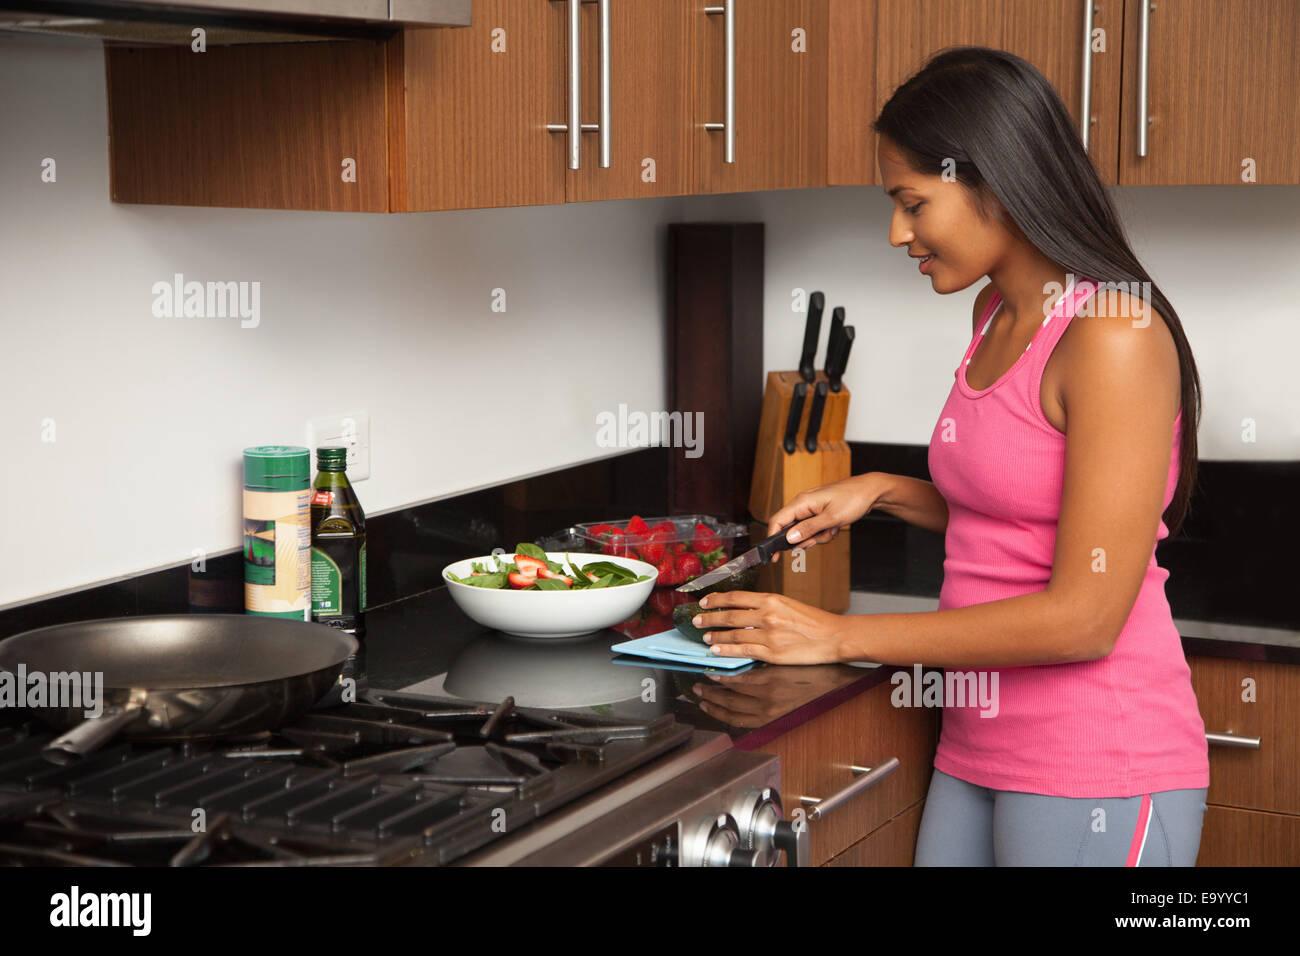 Woman preparing salad in kitchen - Stock Image